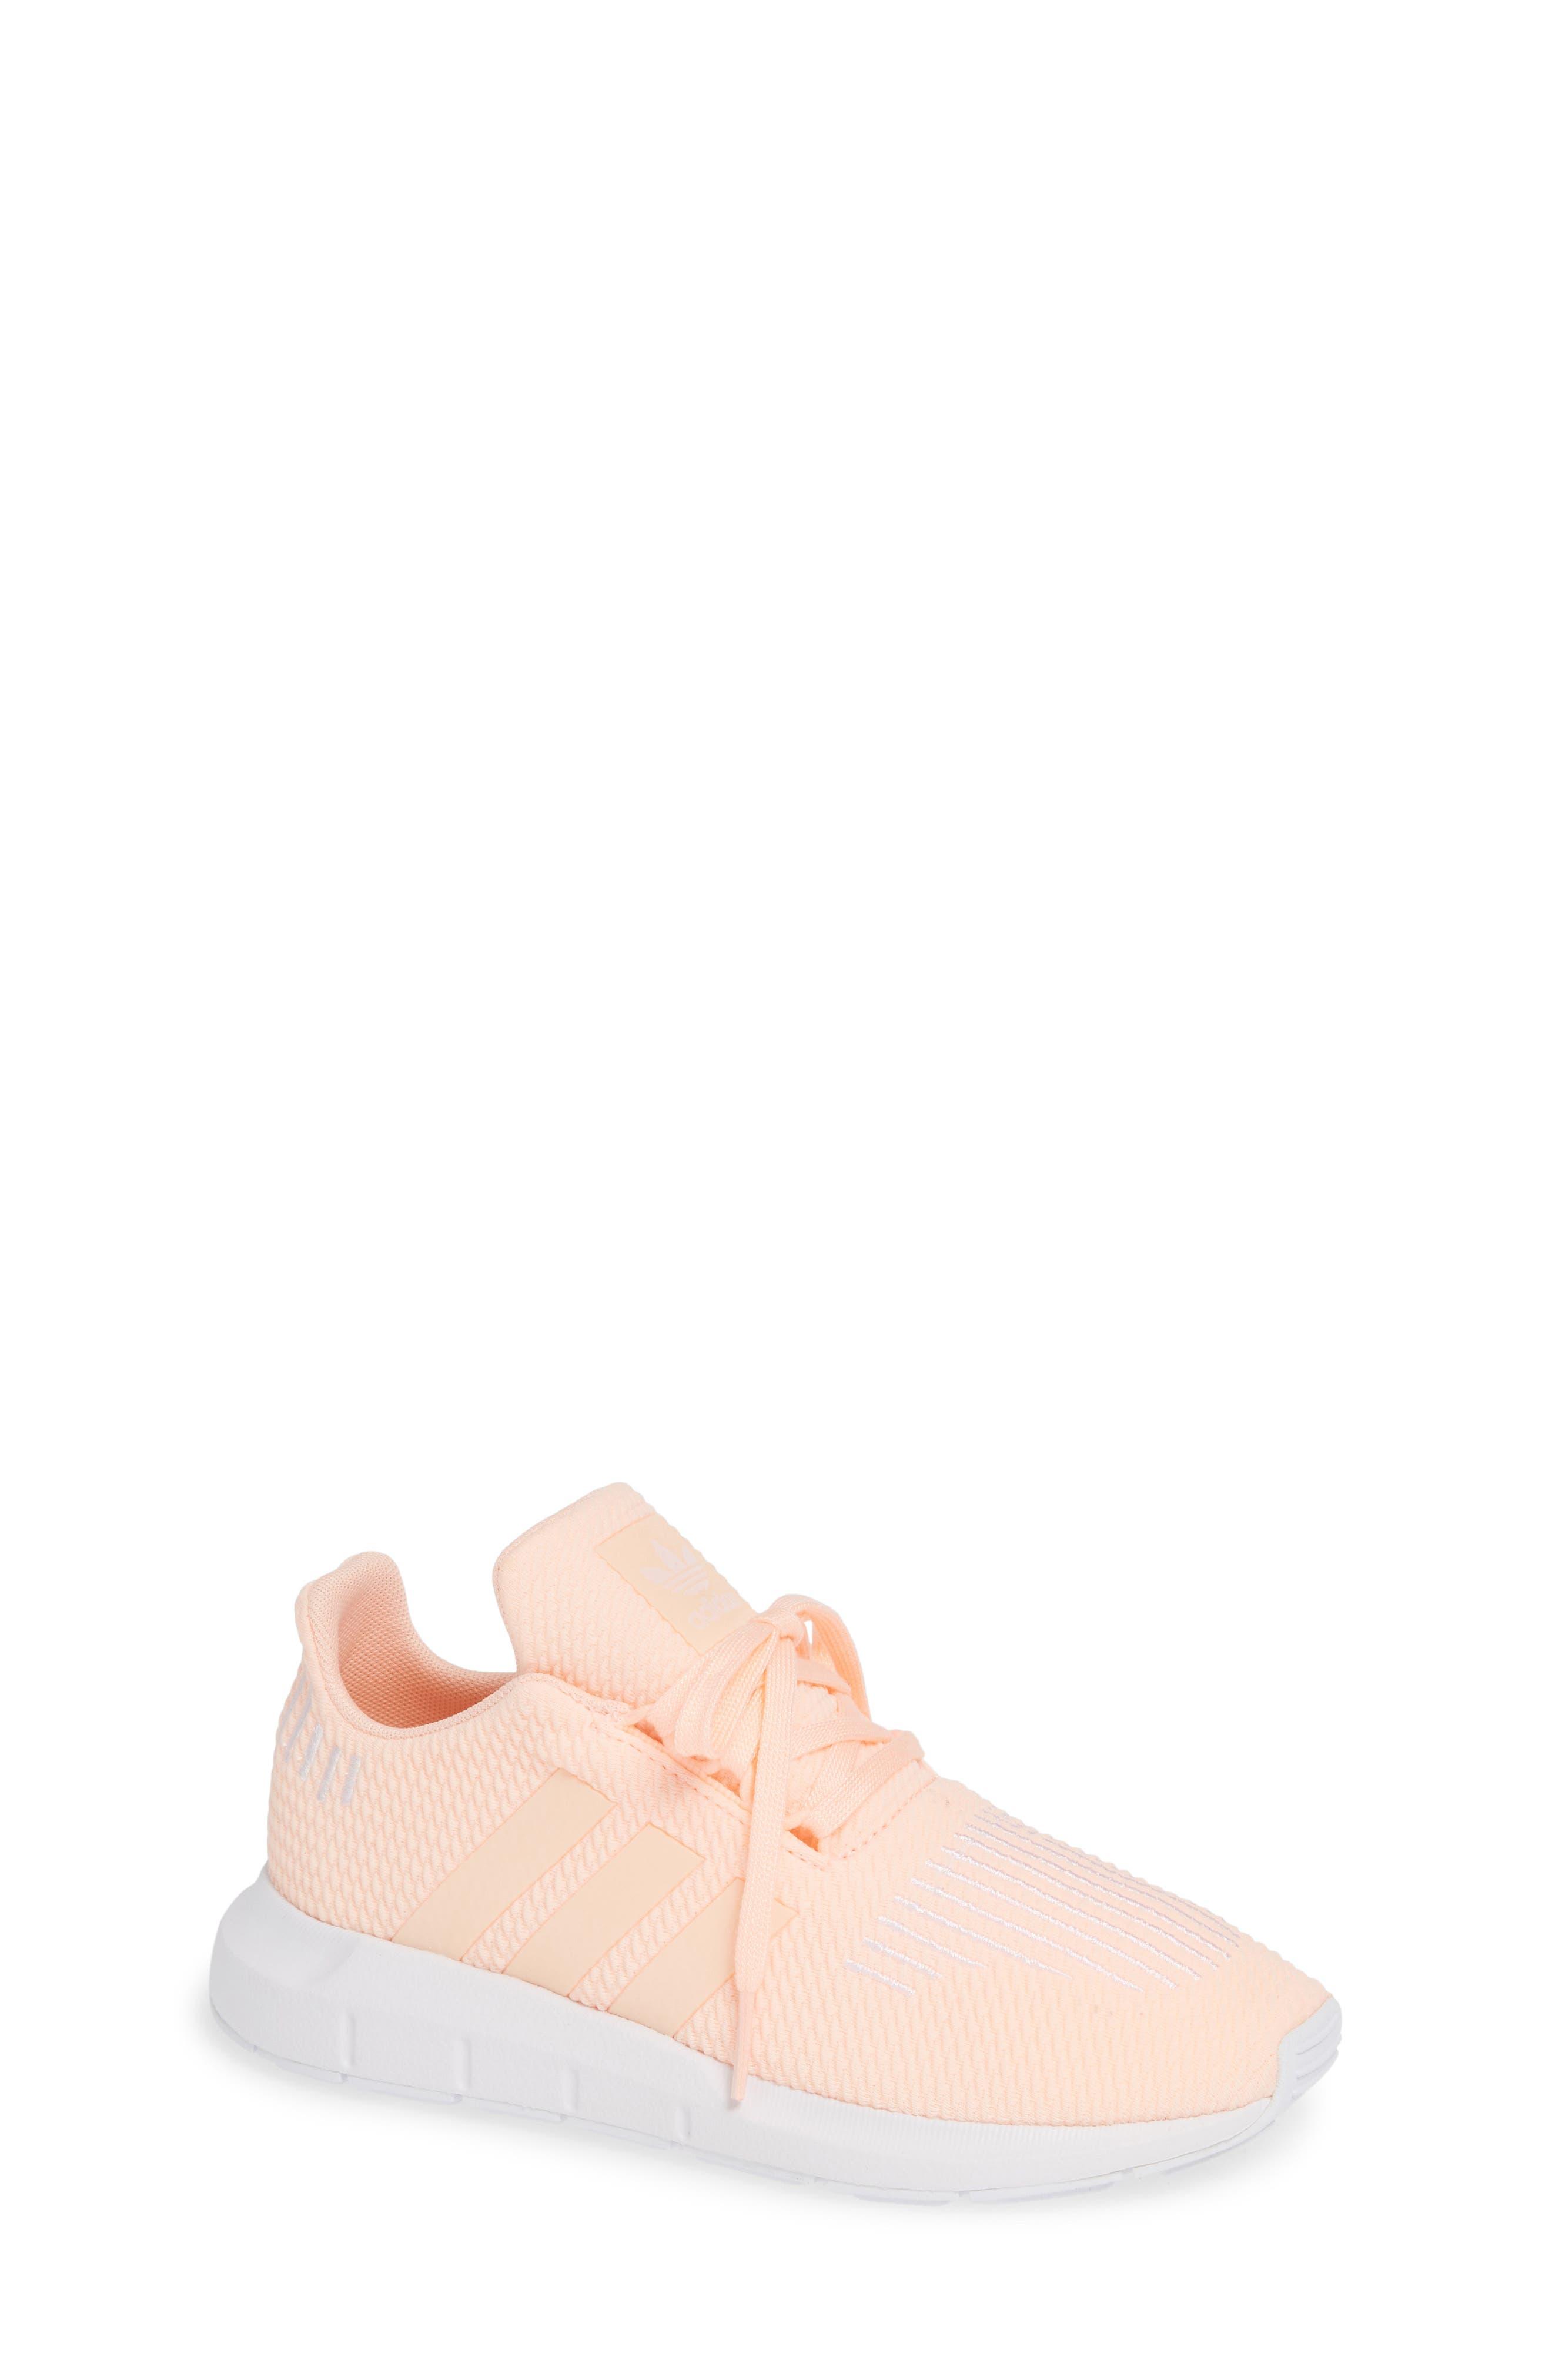 Toddler Adidas Swift Run J Sneaker Size 105 M  Coral